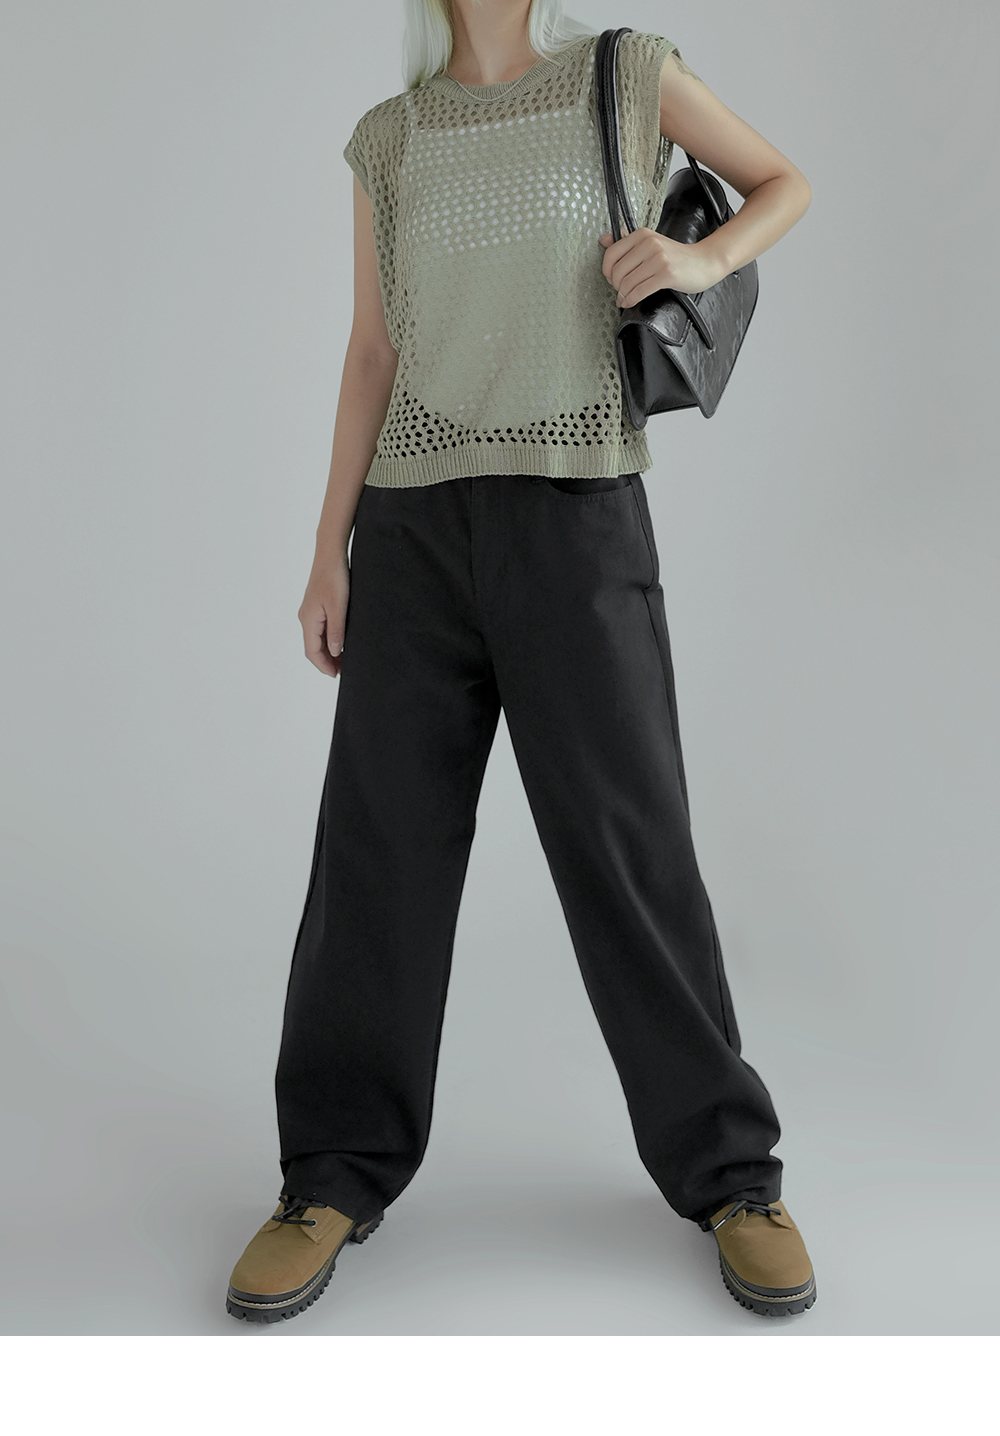 Connie Net Sleeveless Knitwear